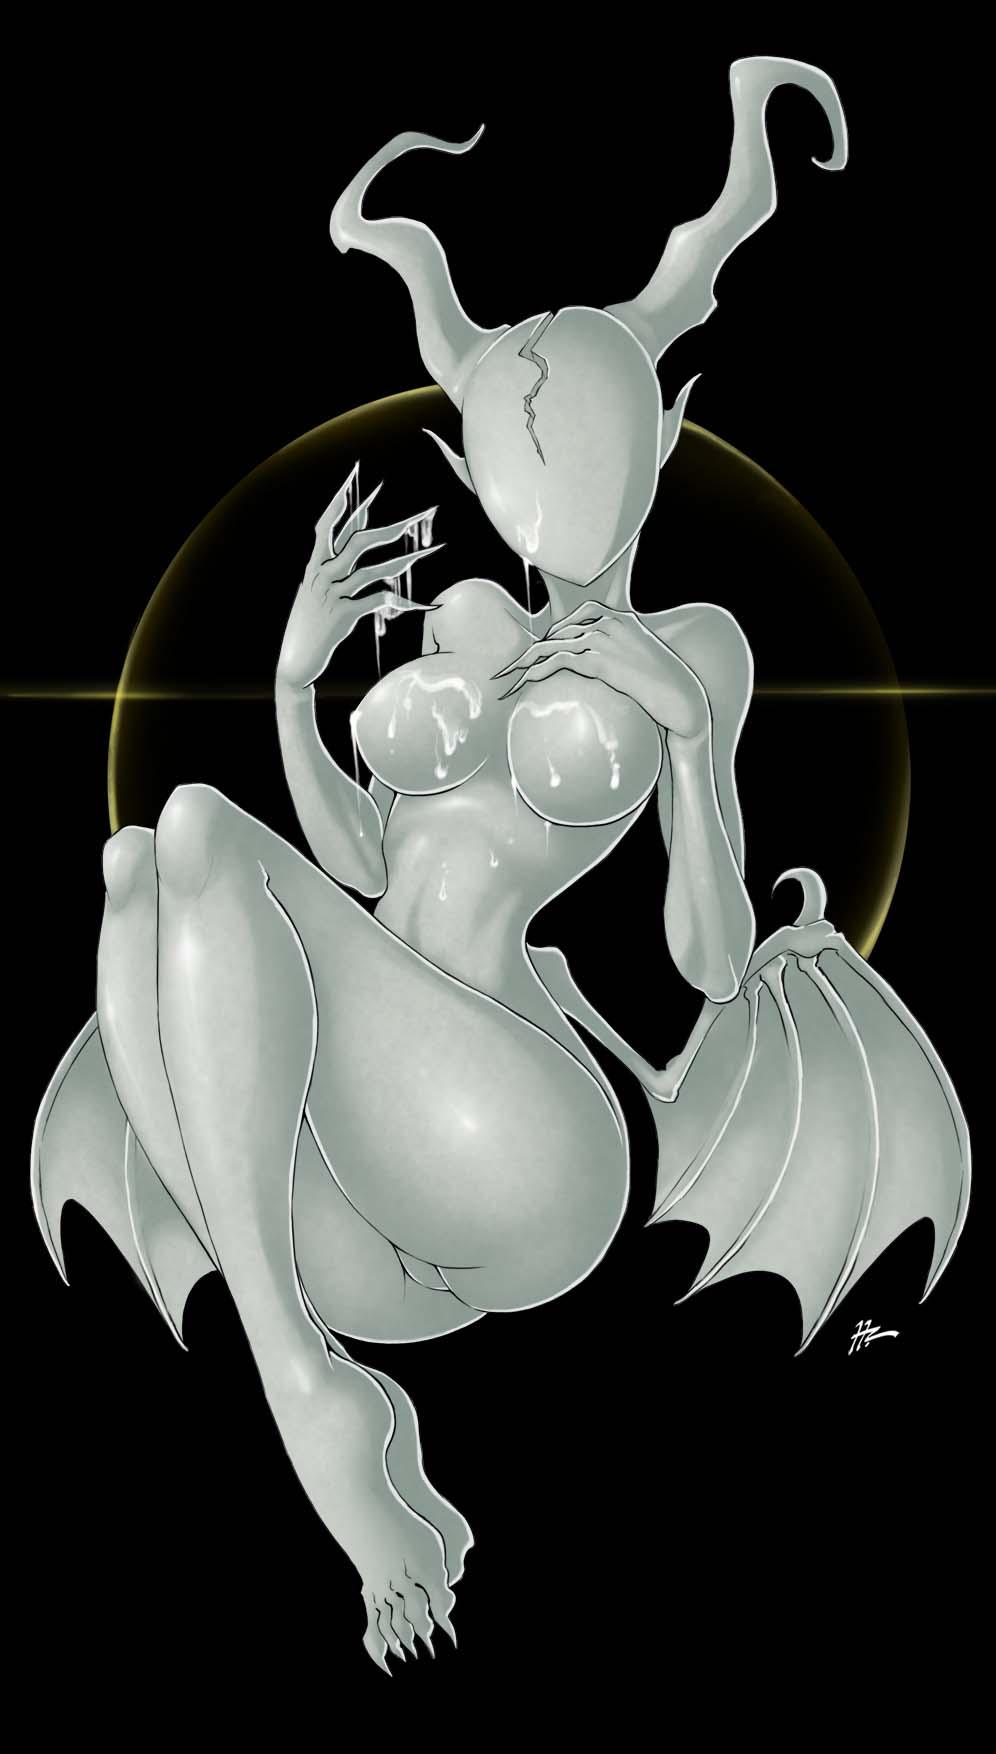 1 souls gargoyle bell dark A friendly orc daily life